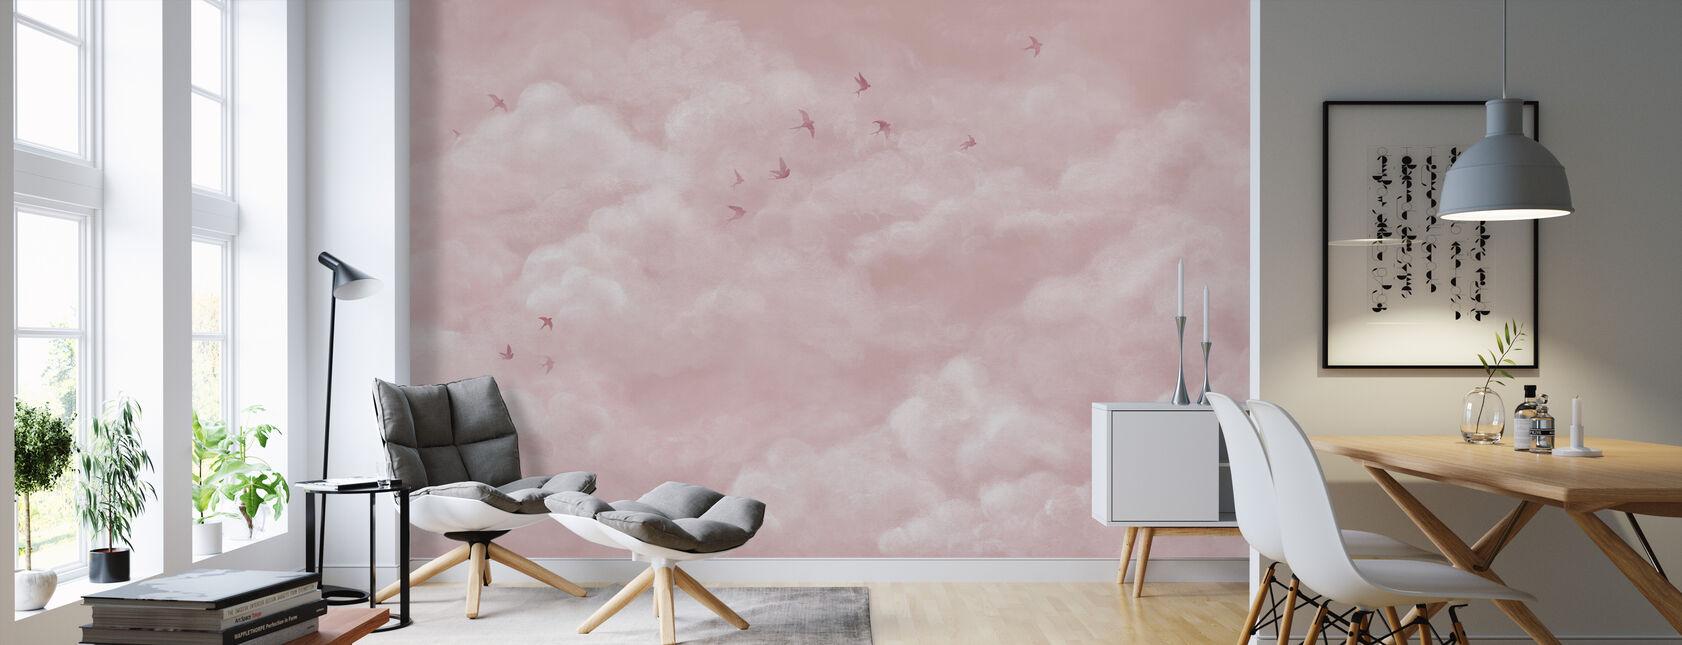 Tender skyer med svaler - Pink - Tapet - Stue